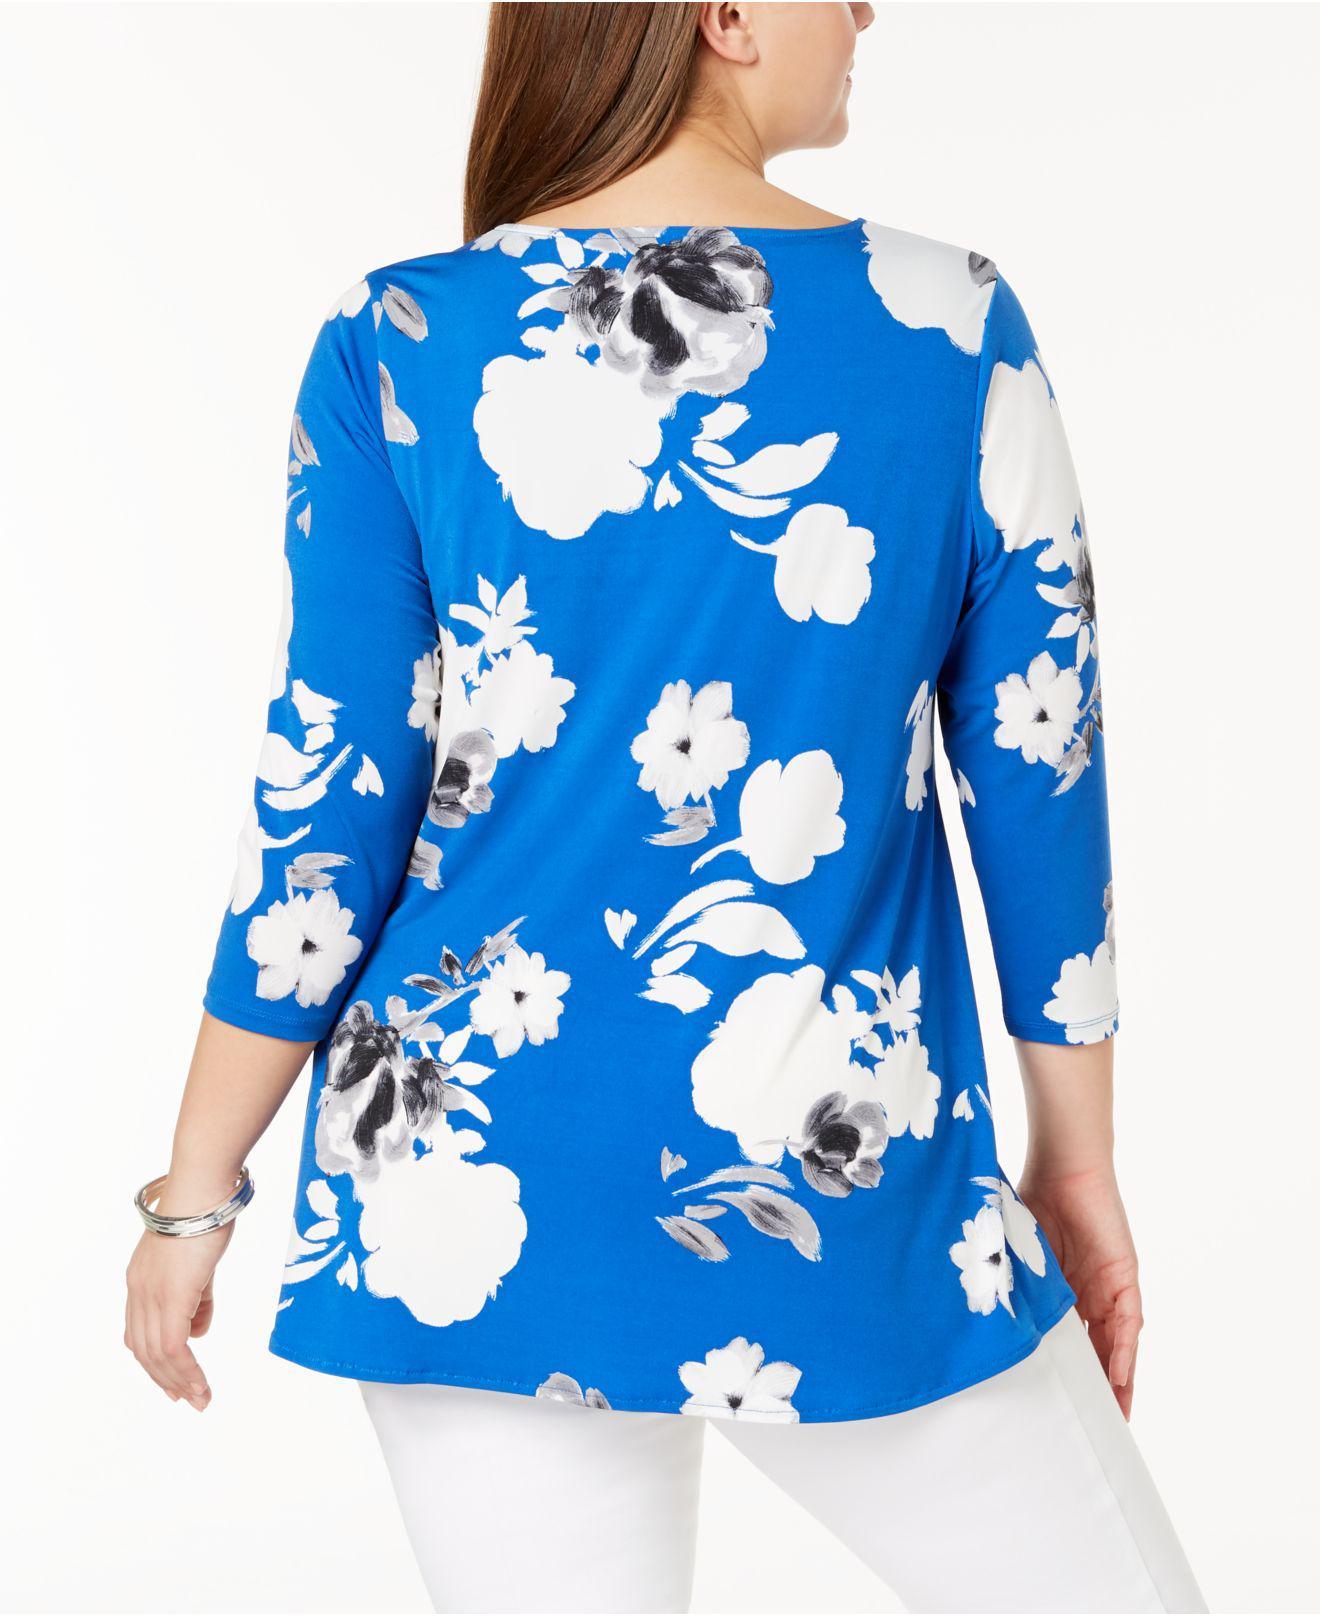 06a3ec9f258 Lyst - Alfani Plus Size Floral-print Cutout Tunic